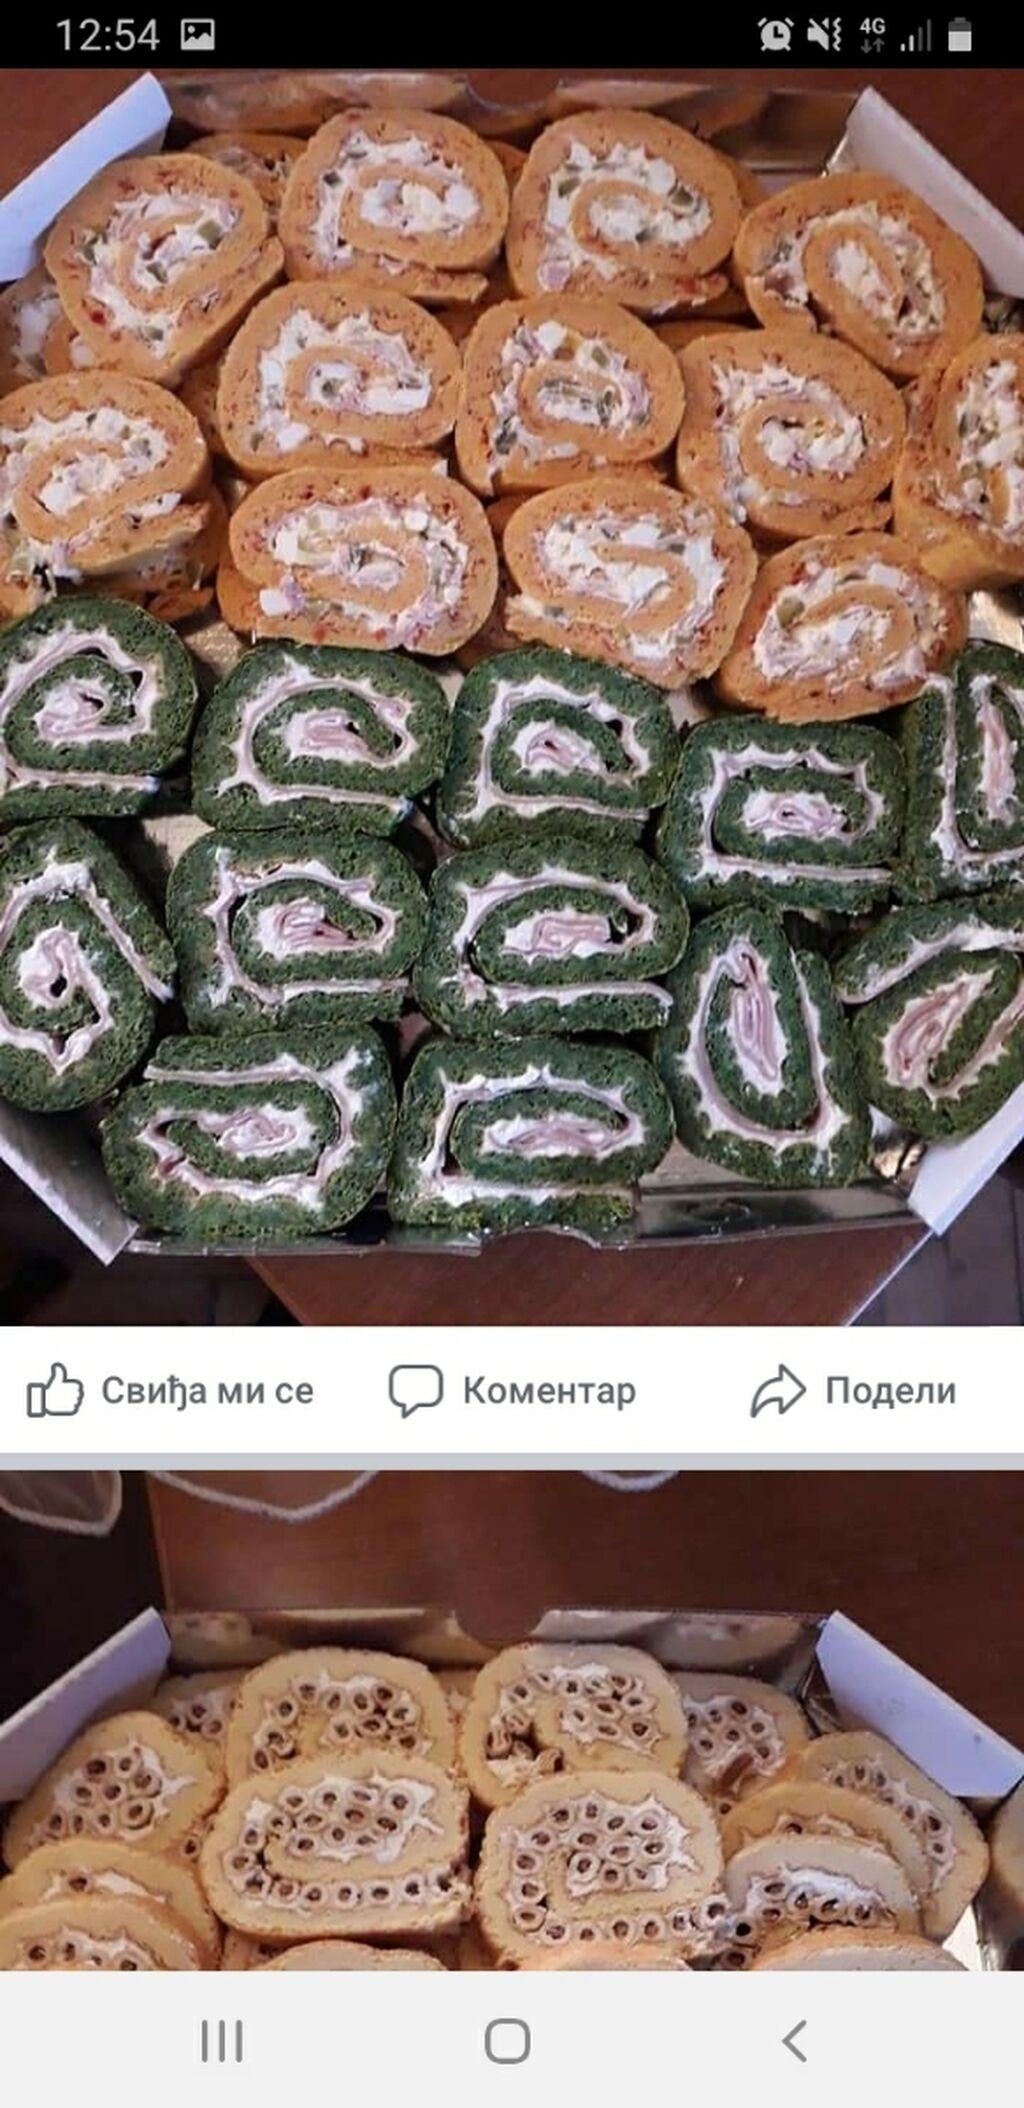 Ketering - Beograd: Slani letering